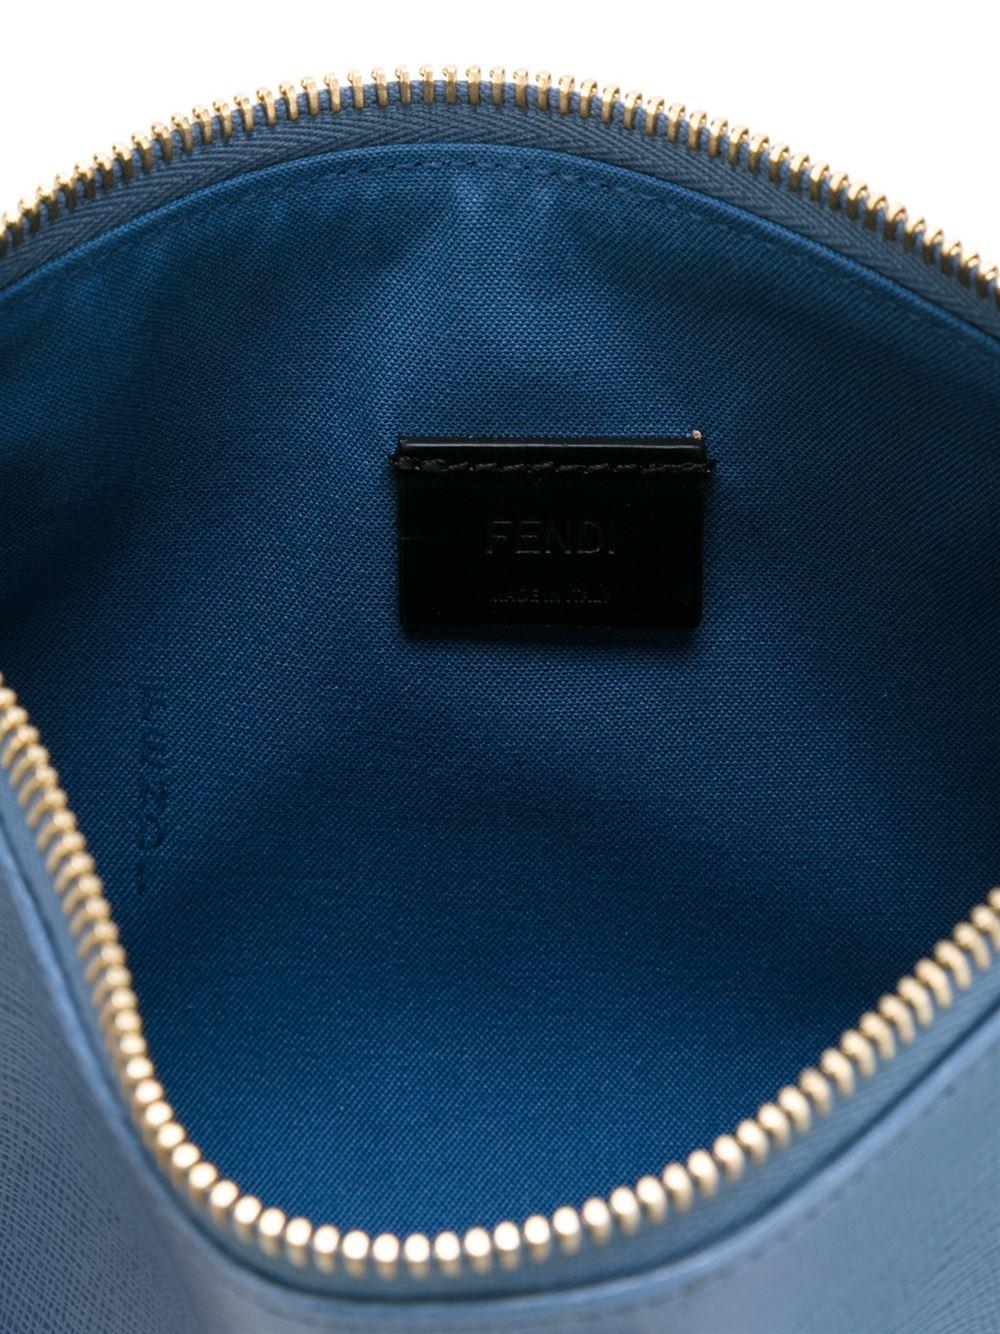 Fendi Micro 'crayons' Cross Body Bag in Blue